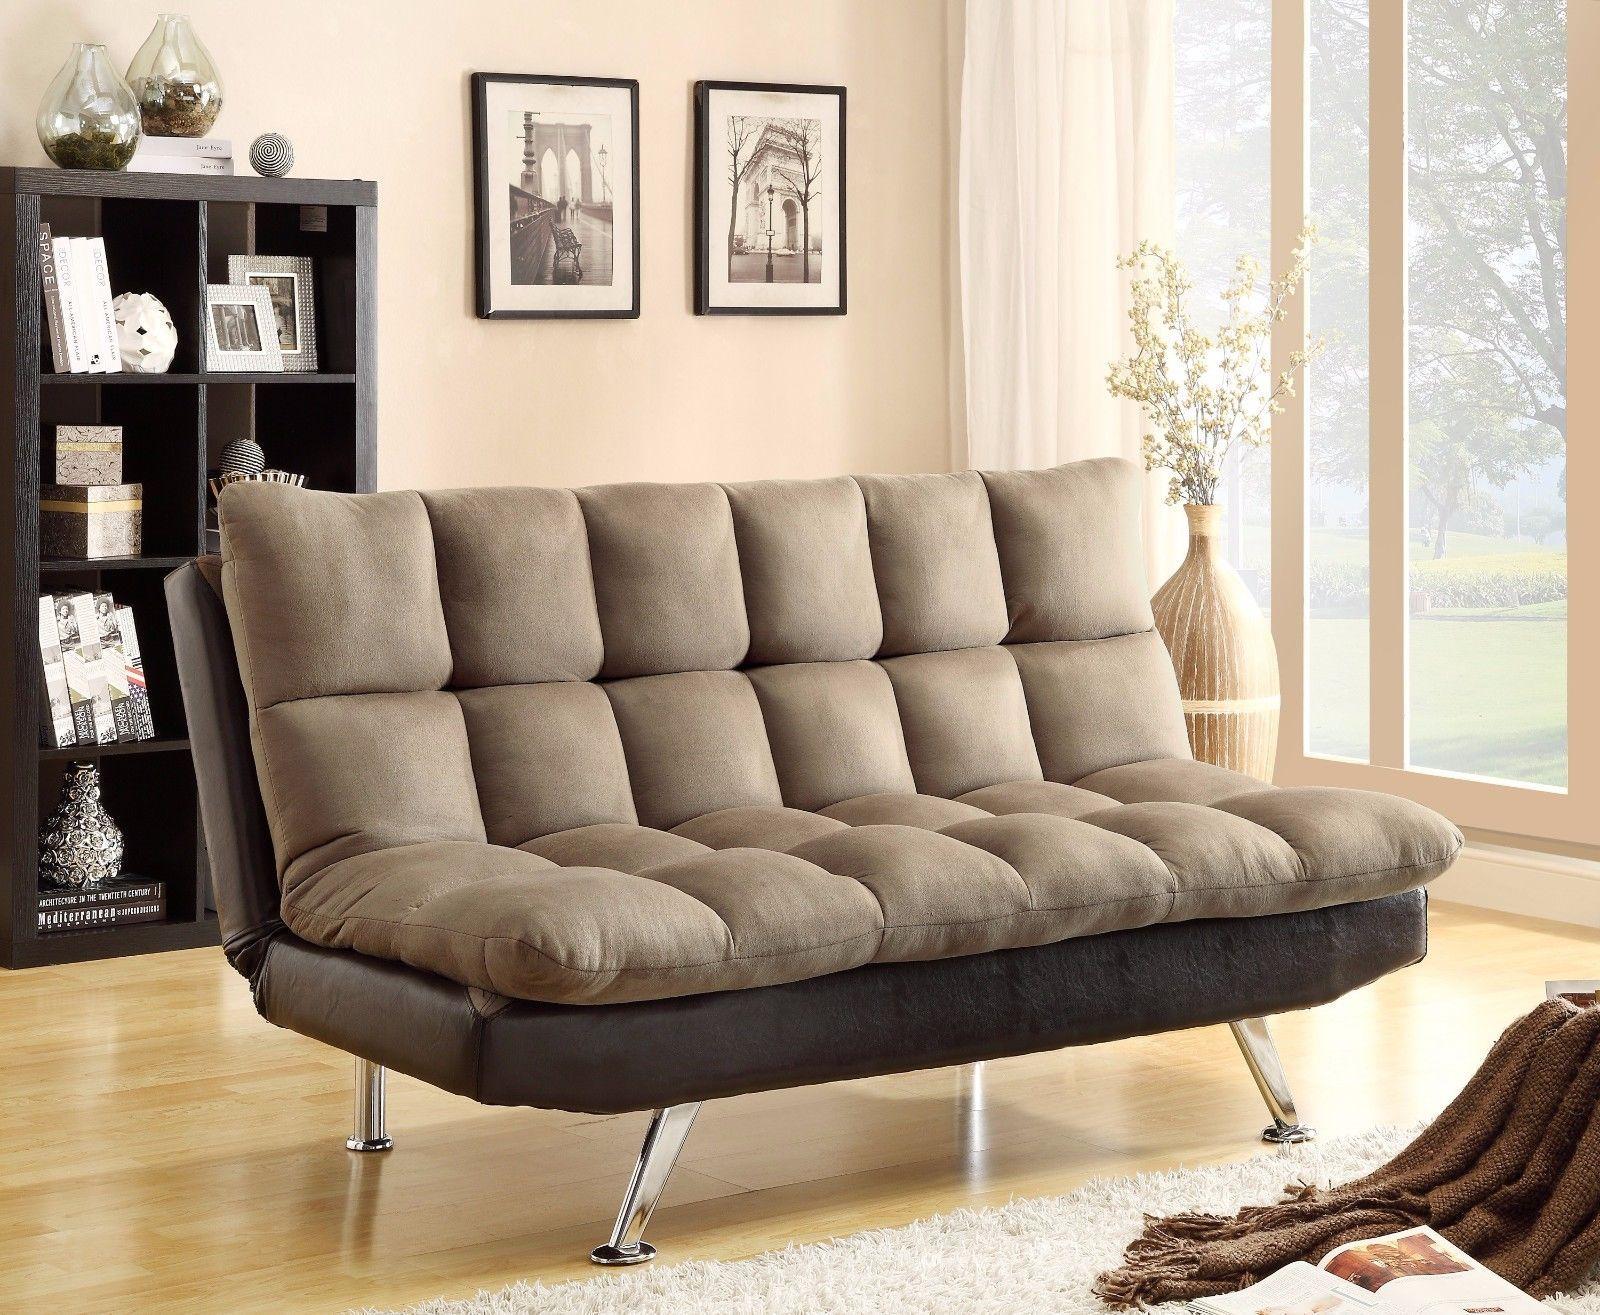 Crown Mark 5250 Sundown Adjustable Living Room Sofa Espresso Transitional Style